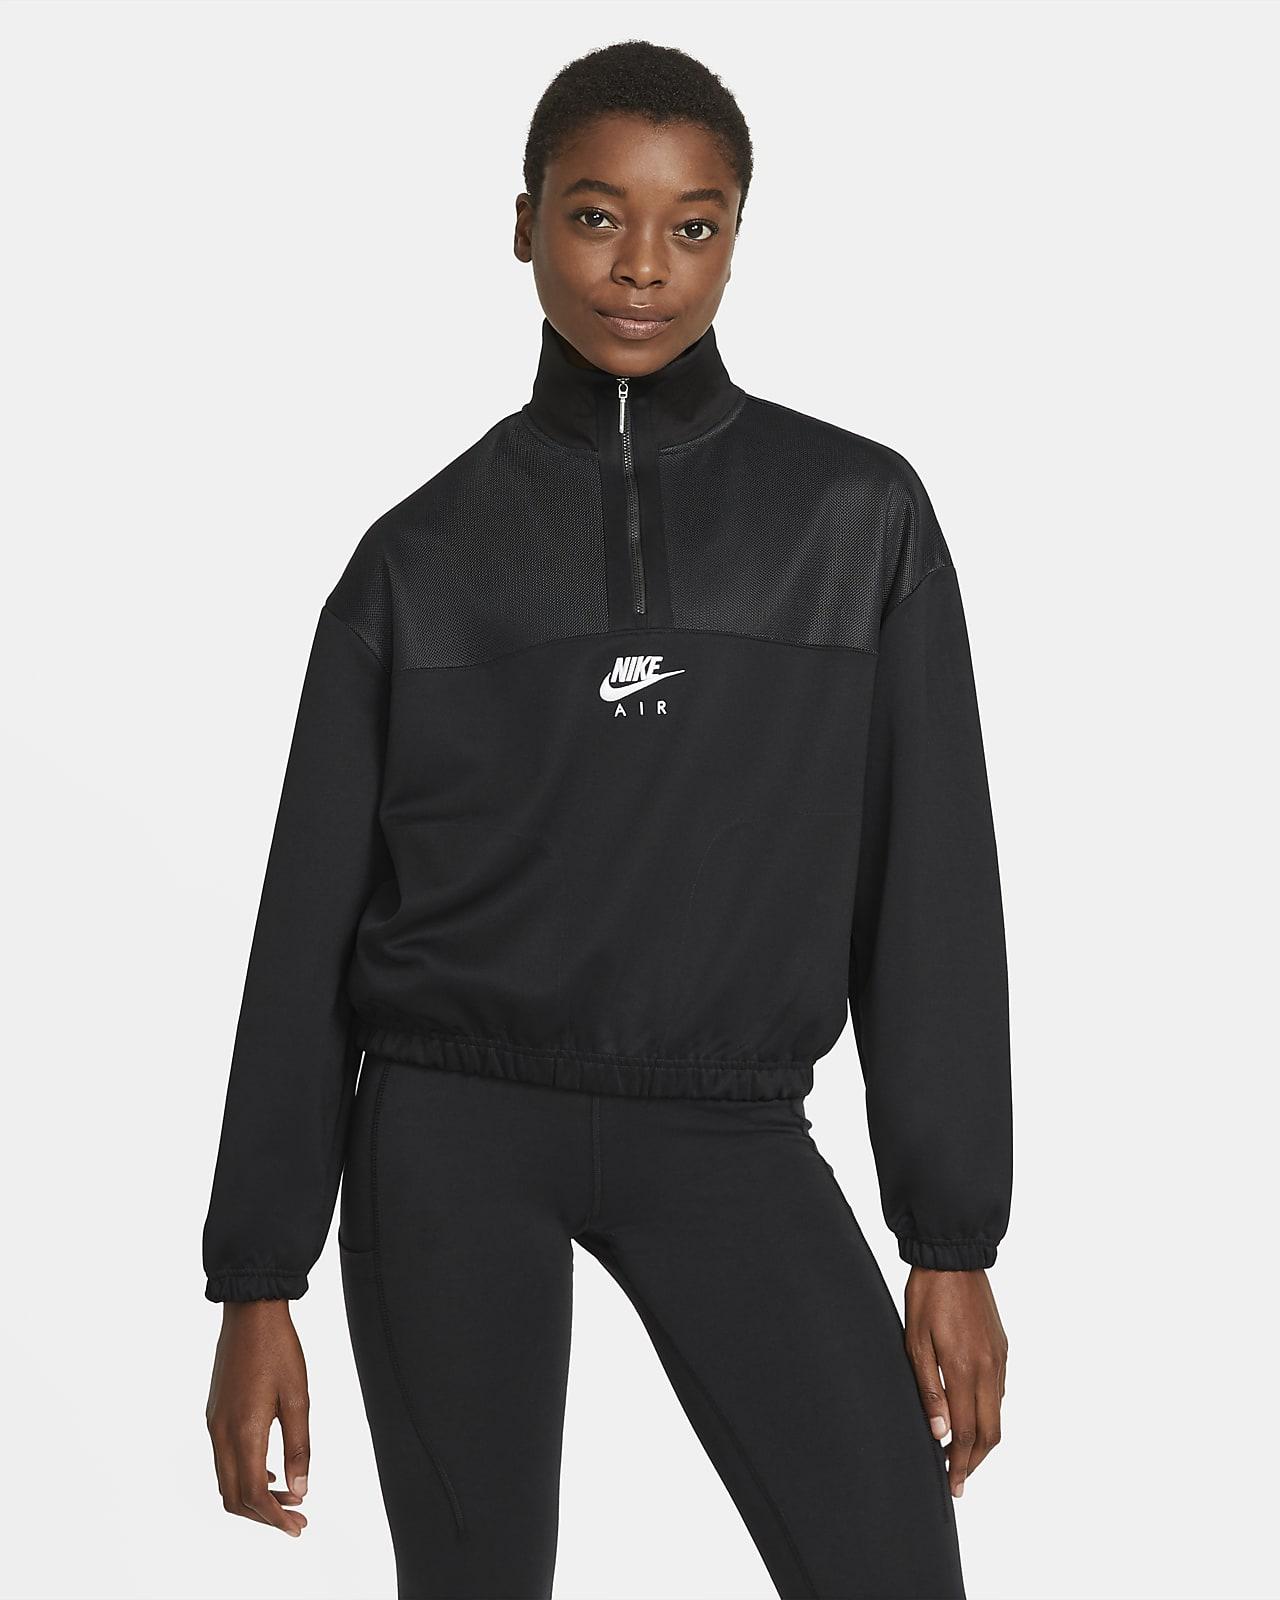 Nike Air Women's 1/4-Zip